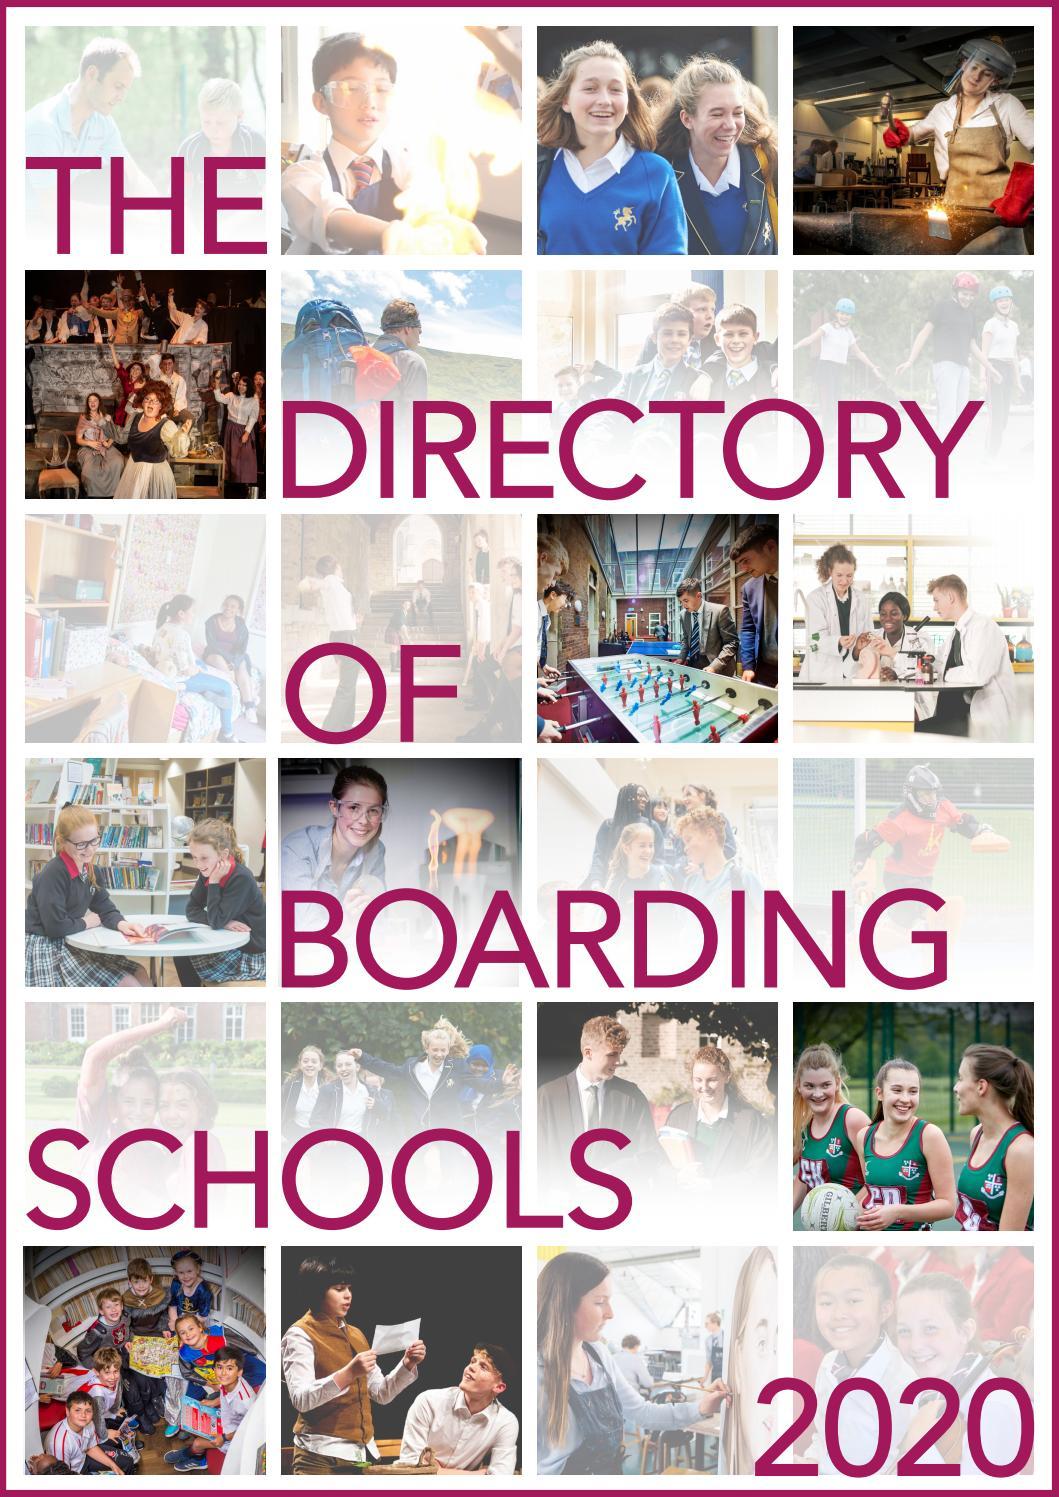 Boarding Schools Directory 20 by Lance Publishing   issuu